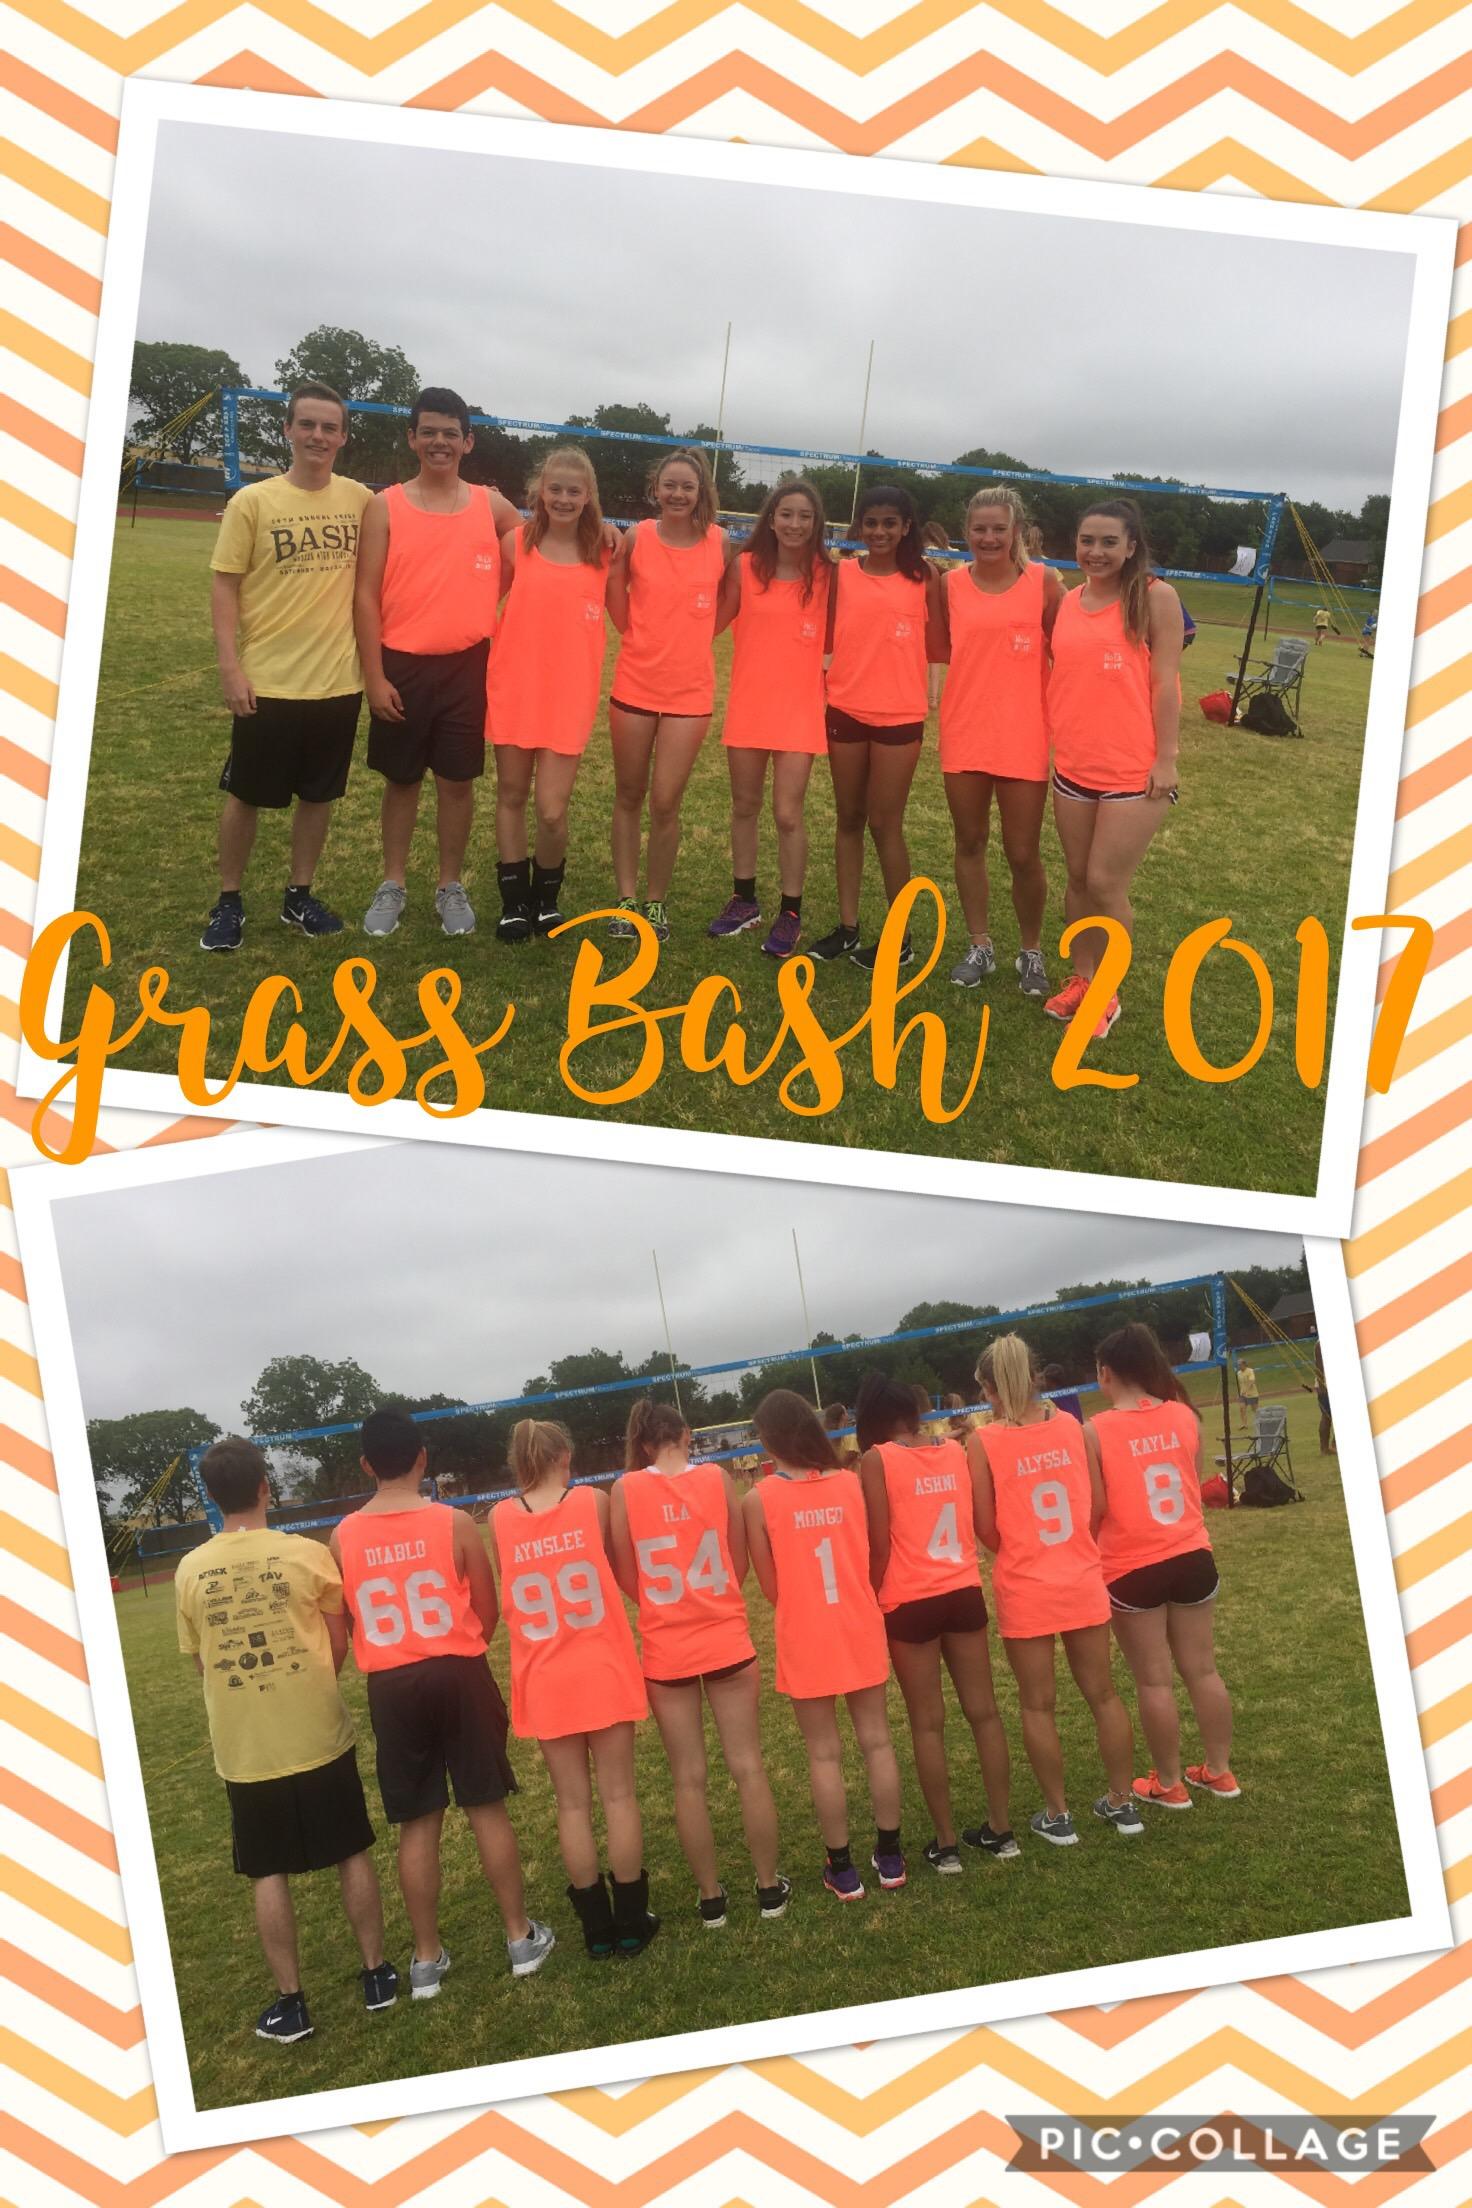 marcus high school grass bash 2017 t shirt photo - High School T Shirt Design Ideas